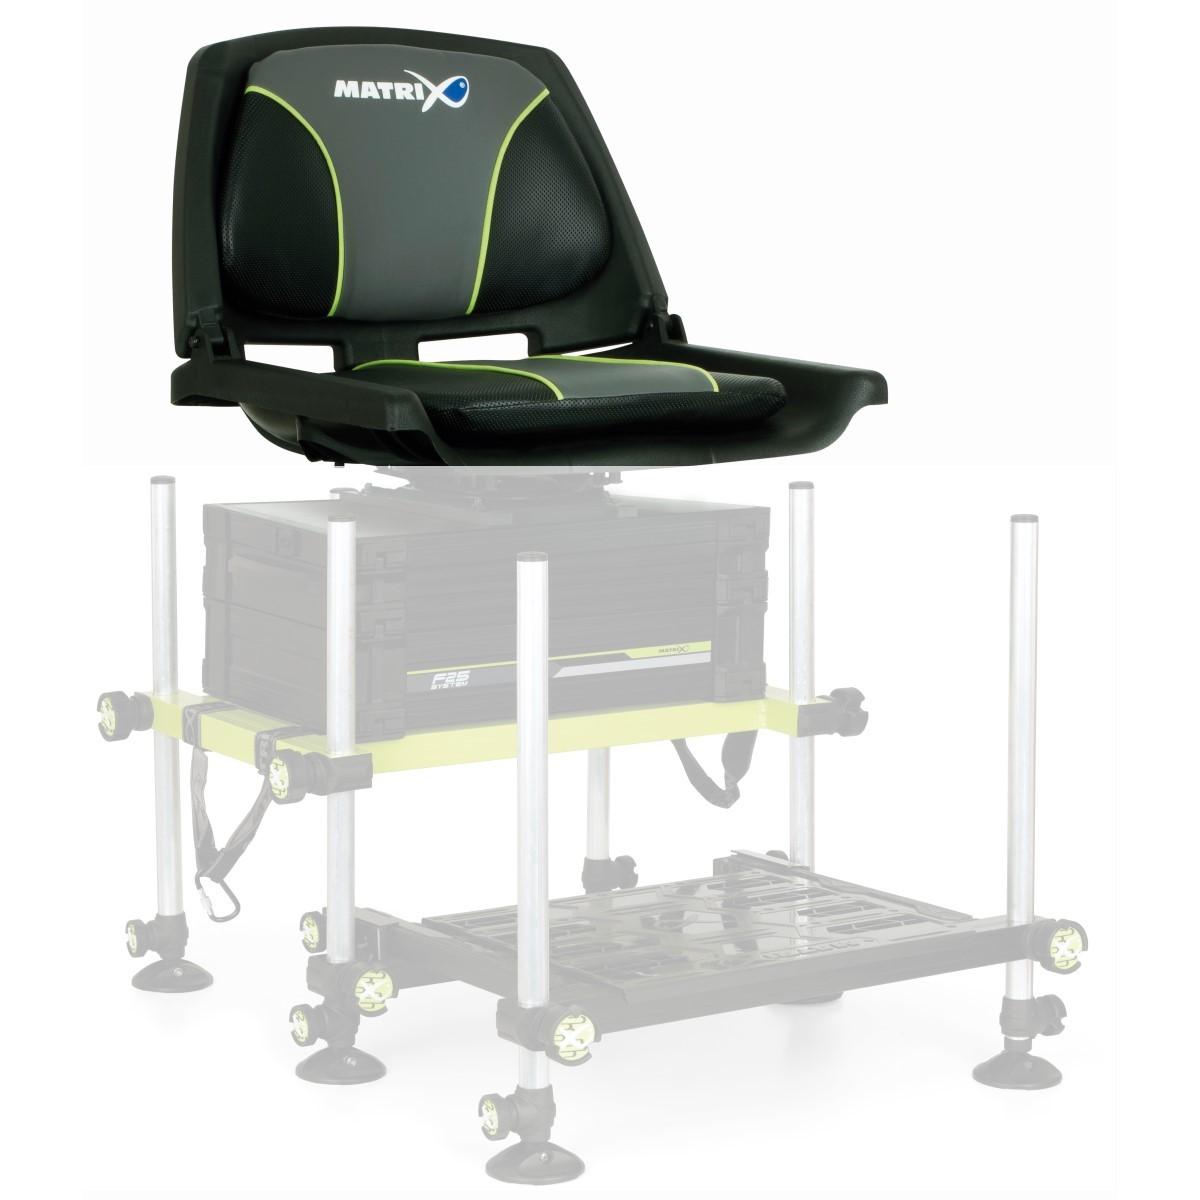 Matrix Swivel Seat Including Base